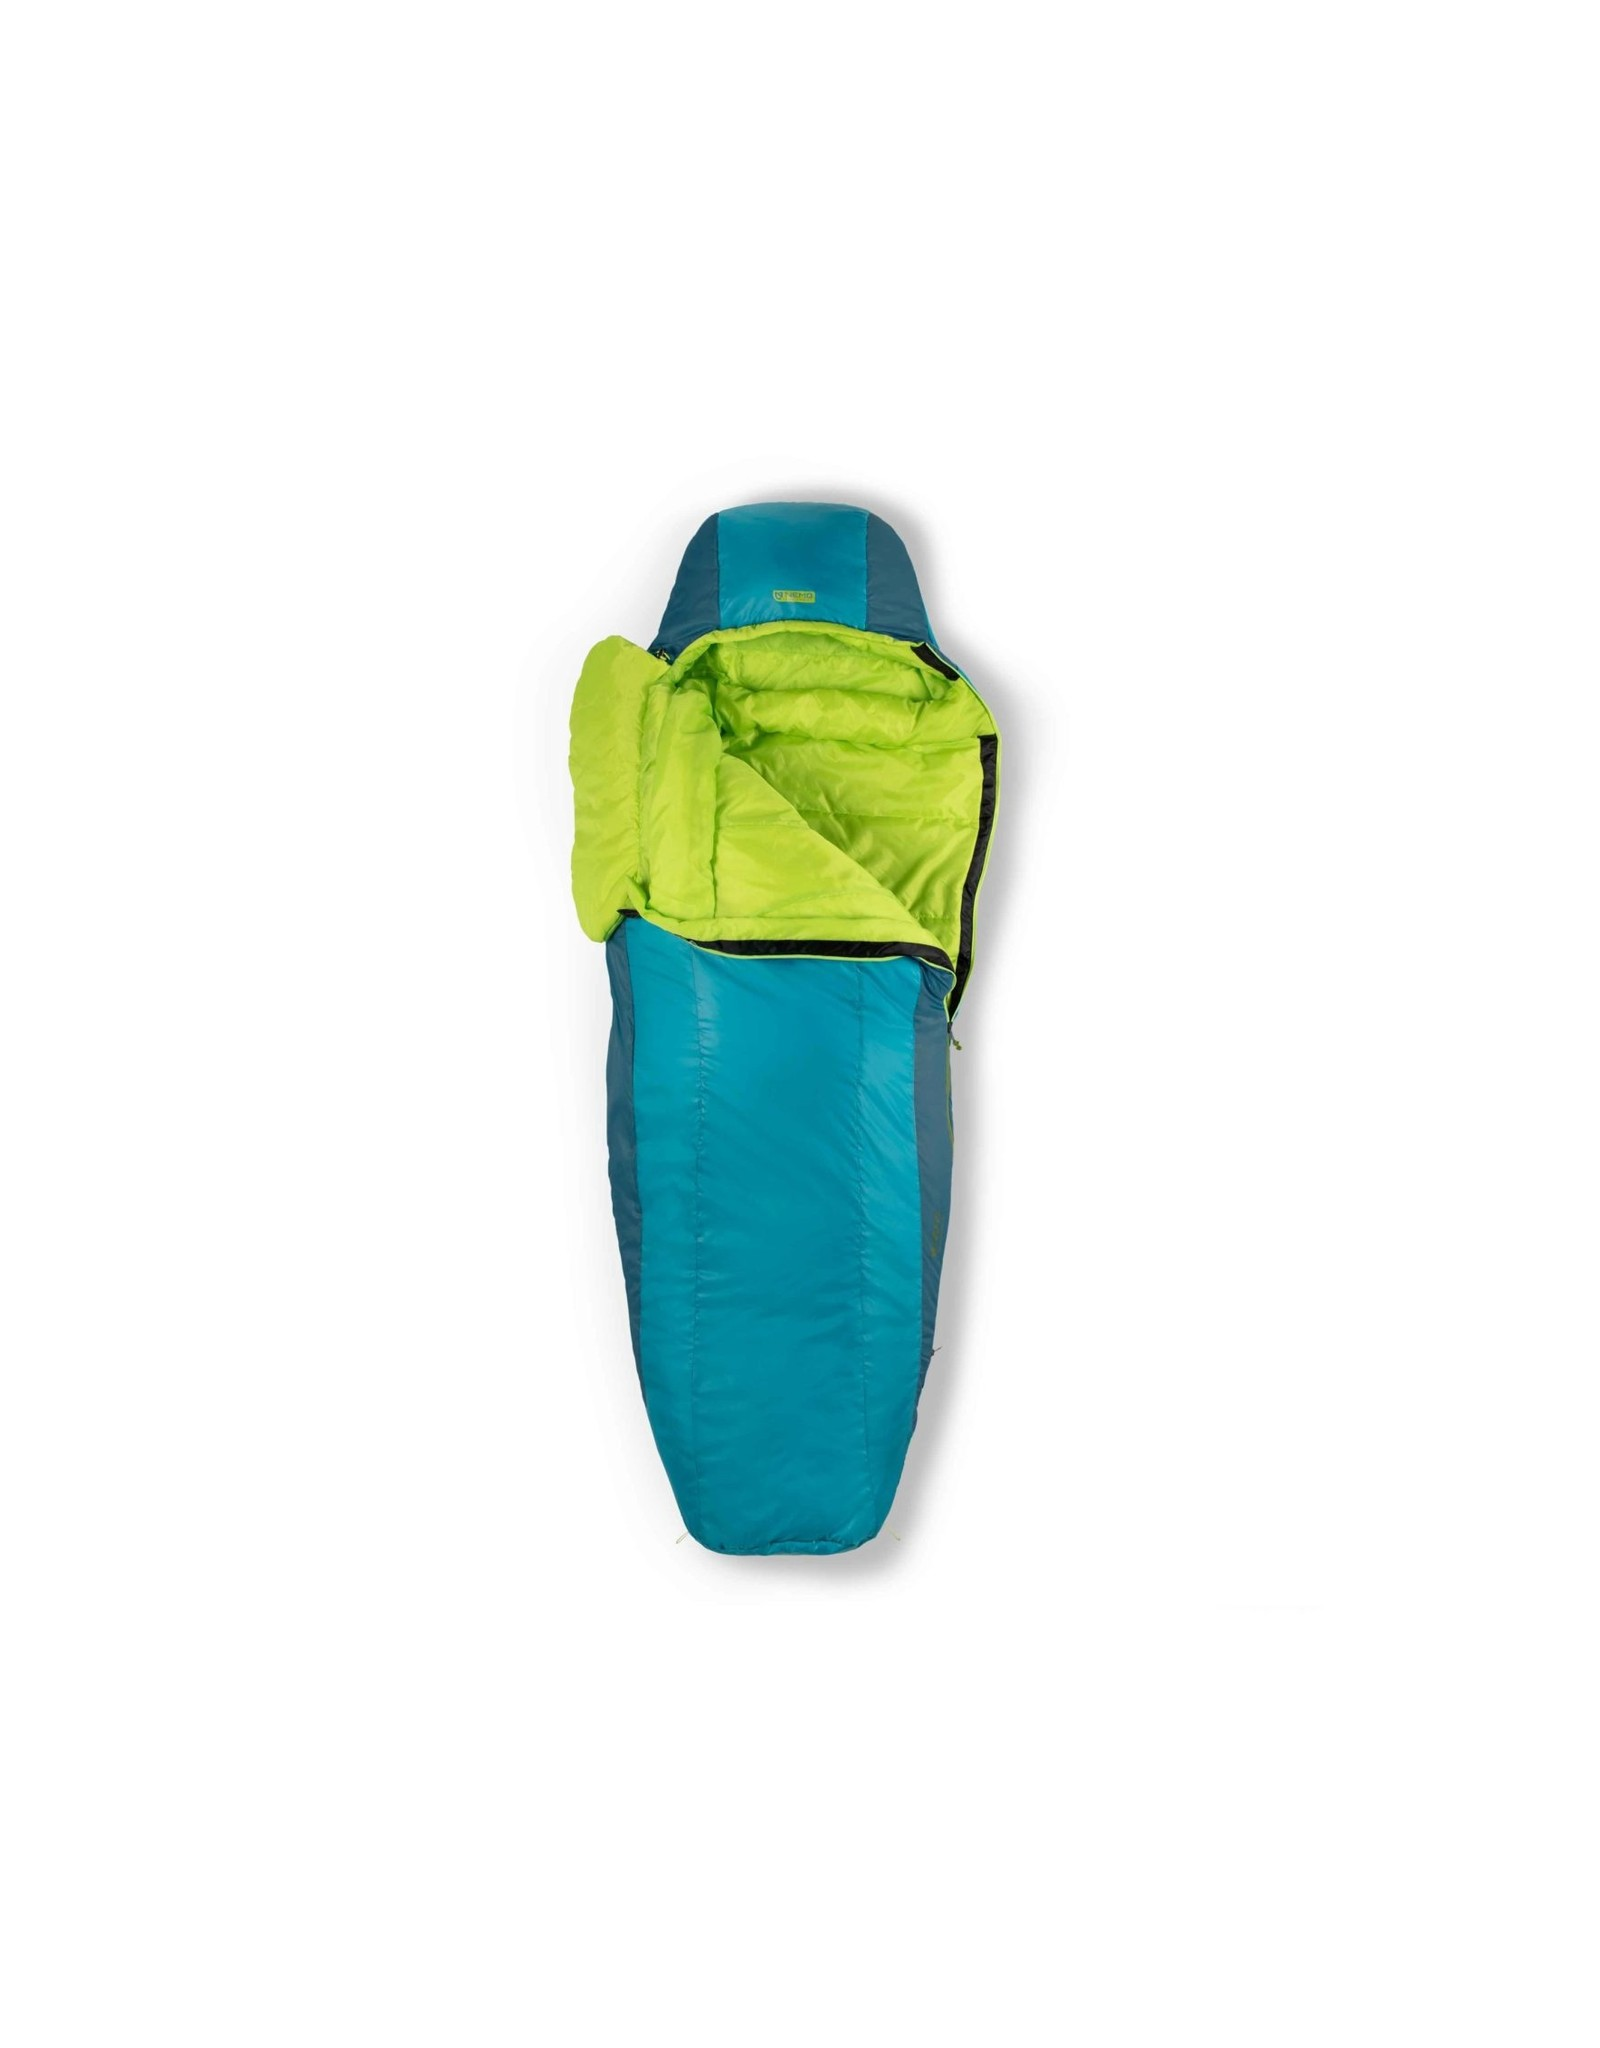 NEMO Tempo 20 Sleeping Bag - Spring Bud - Regular